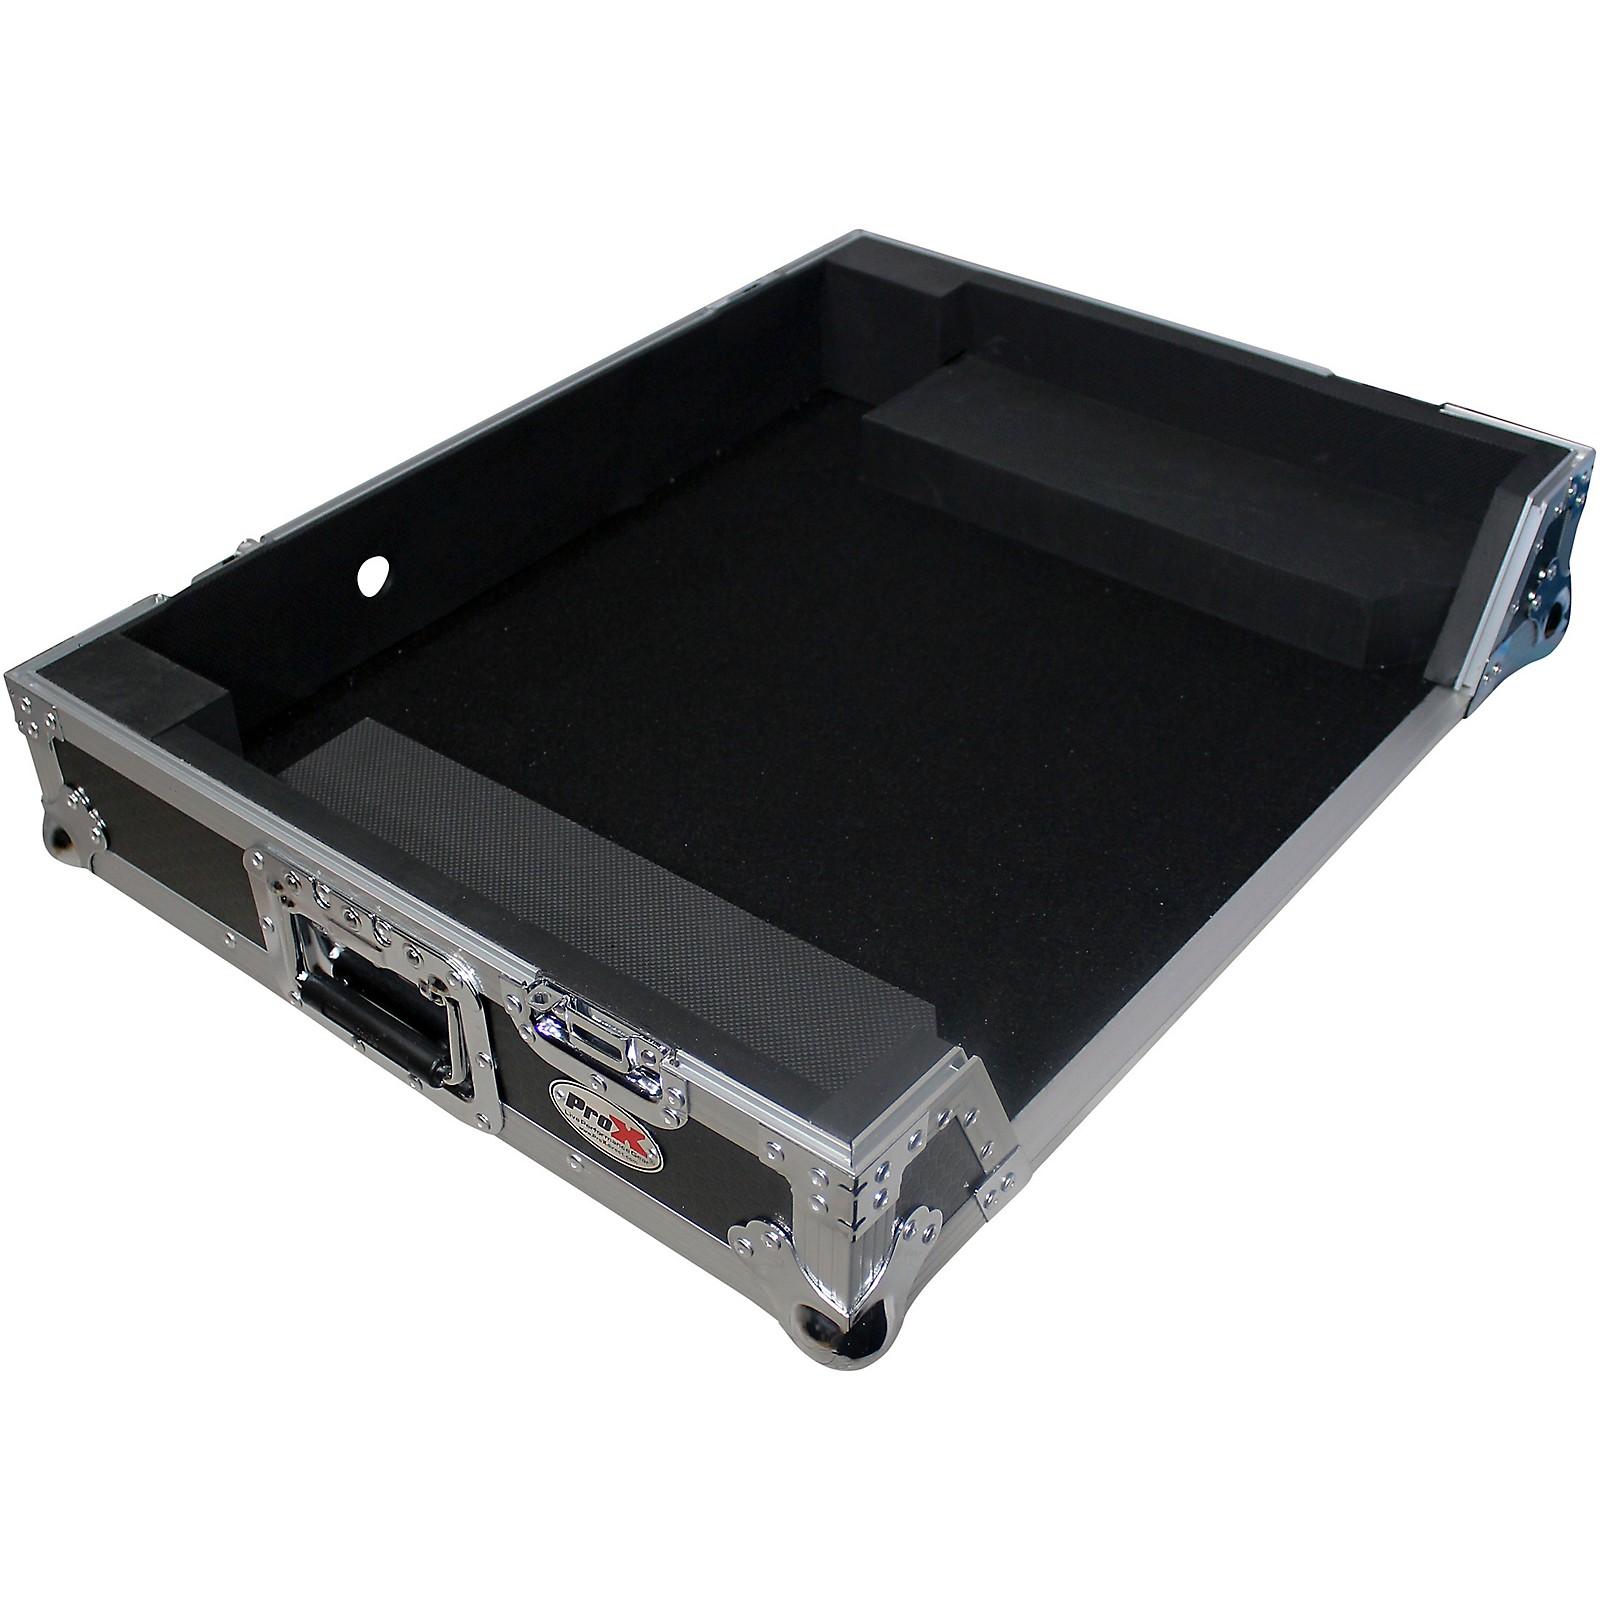 ProX XS-DJ808W ATA-Style Flight Road Case with Wheels for Roland DJ-808 or Denon MC700 DJ Controllers